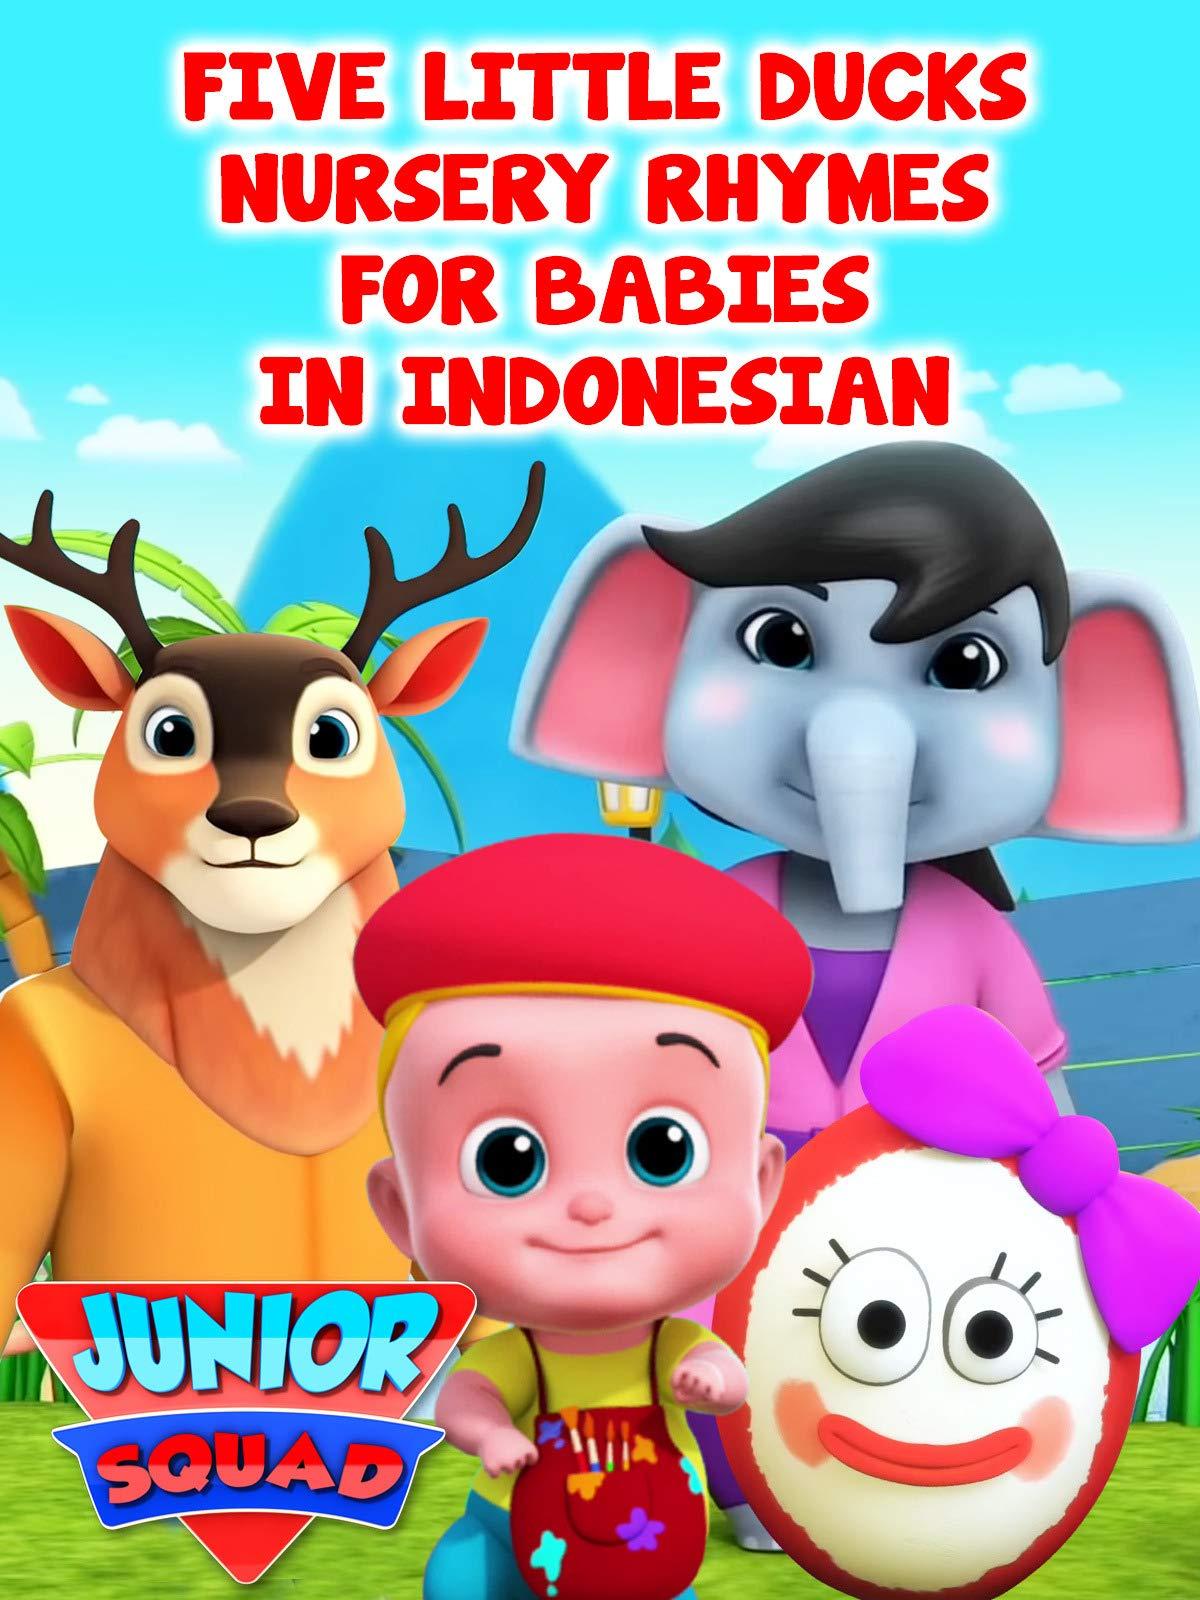 Five Little Ducks Nursery Rhymes for Babies in Indonesian